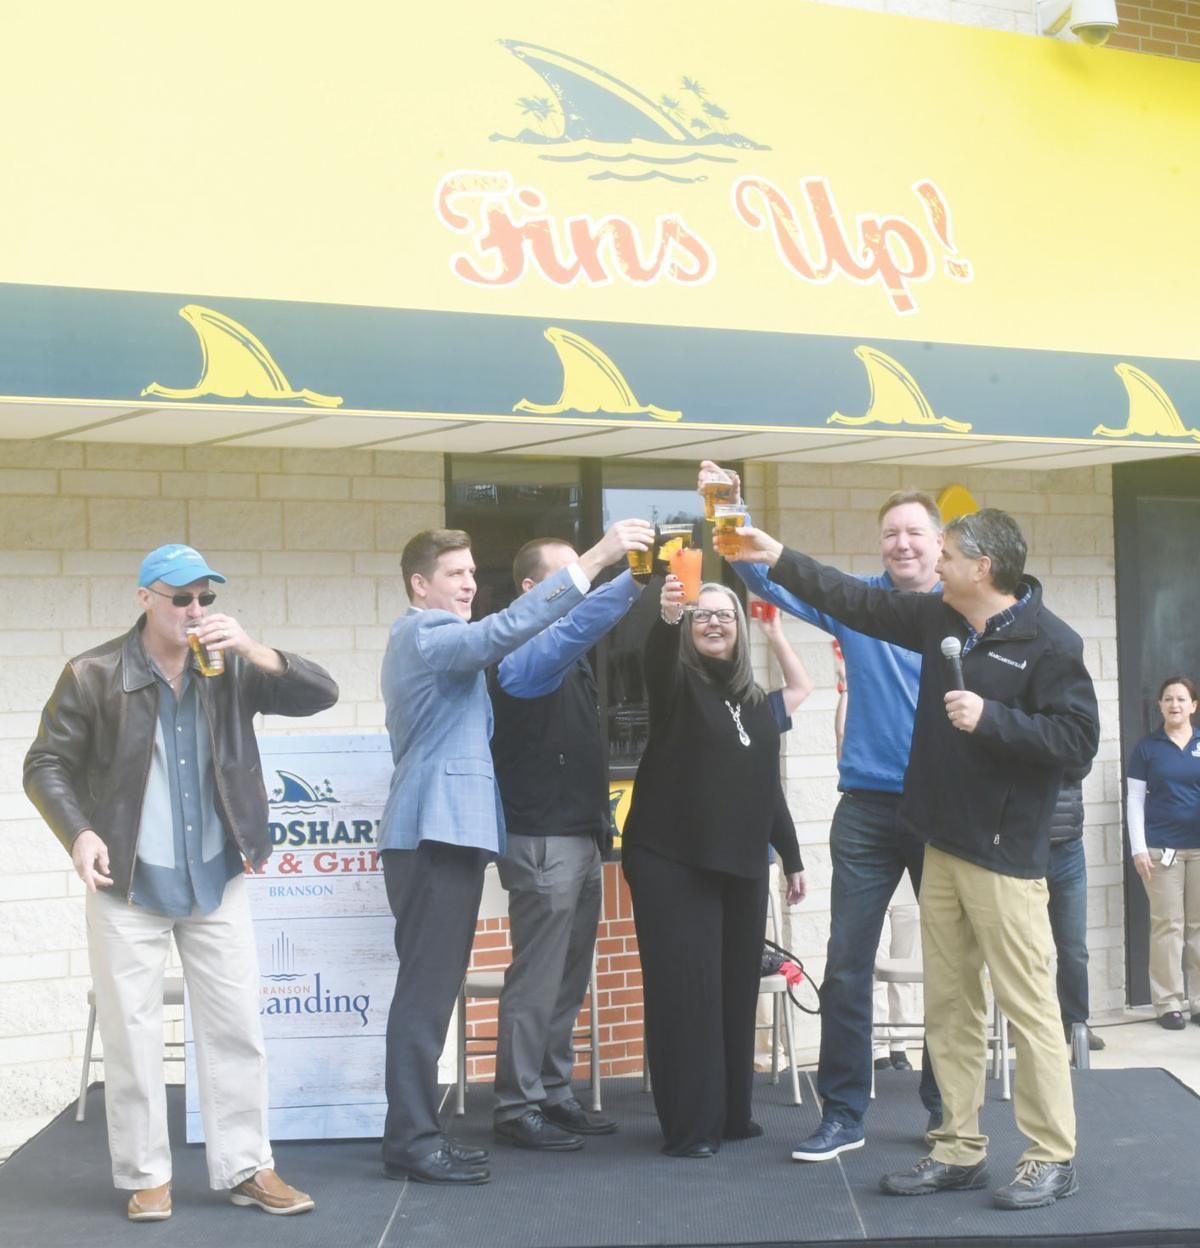 LandShark Bar and Grill opens at Landing